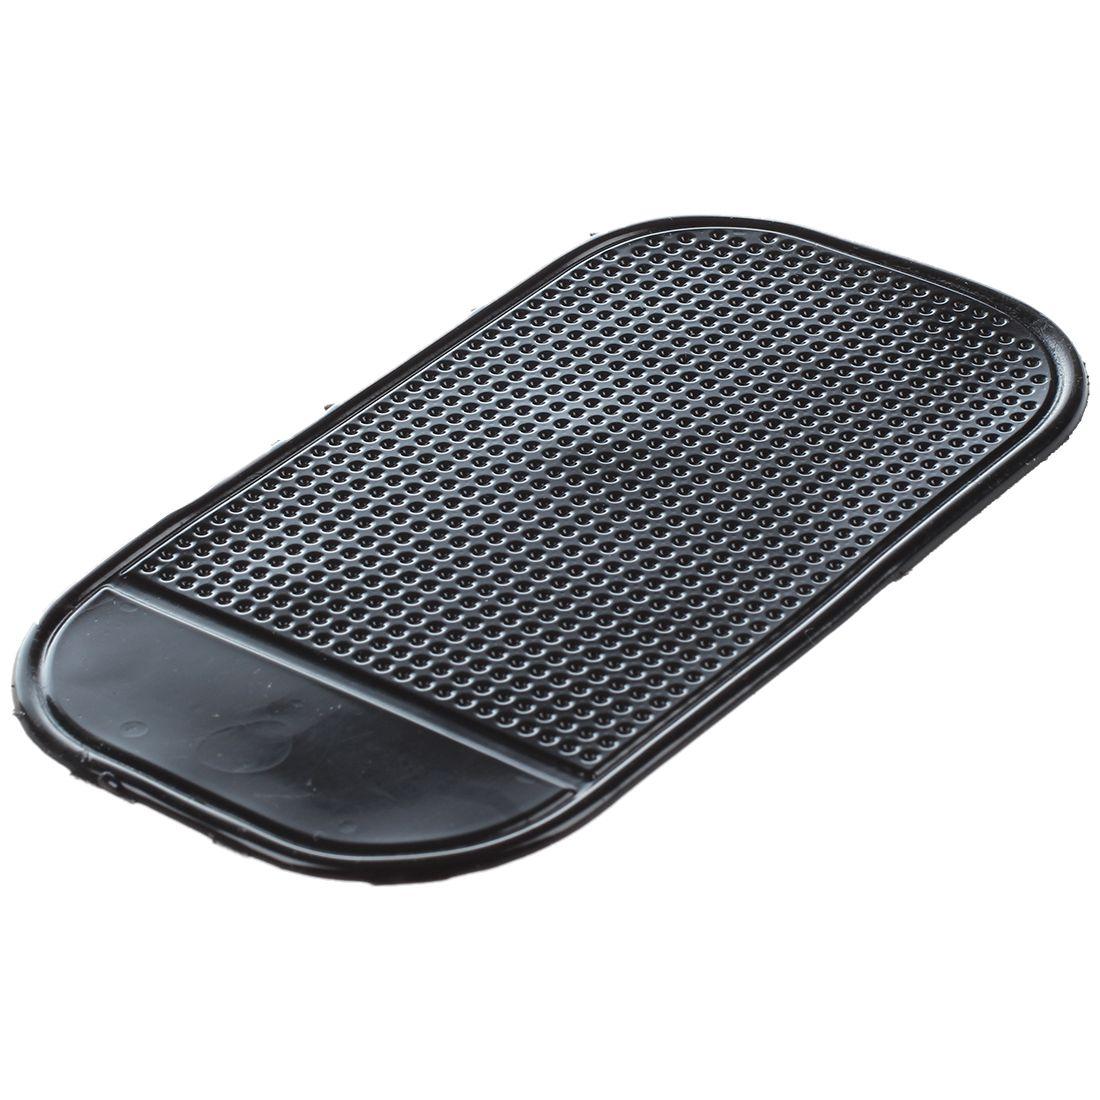 Black Car Dashboard Sticky Pad Mat Anti <font><b>Non</b></font> <font><b>Slip</b></font> Gadget Mobile <font><b>Phone</b></font> GPS <font><b>Holder</b></font> Interior Items Accessories Mount